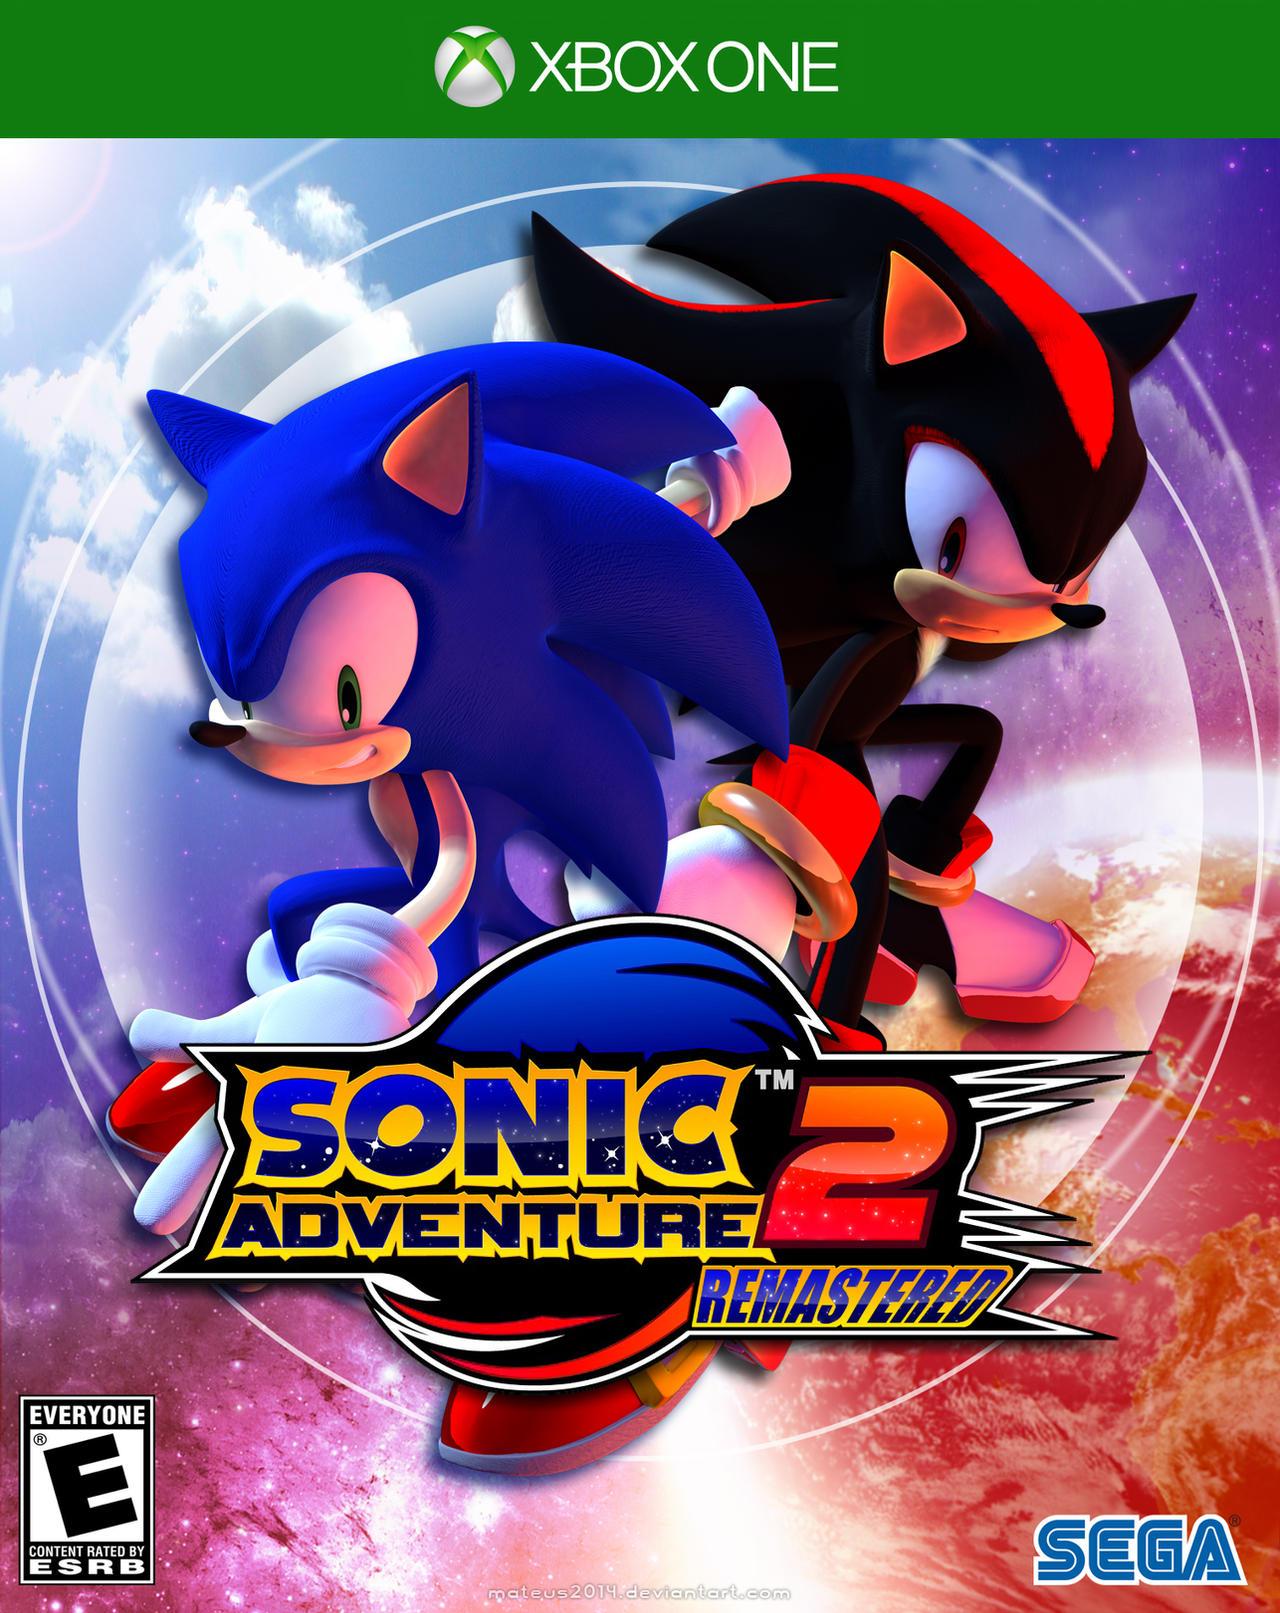 Sonic Adventure 2 Remastered by mateus2014 on DeviantArt